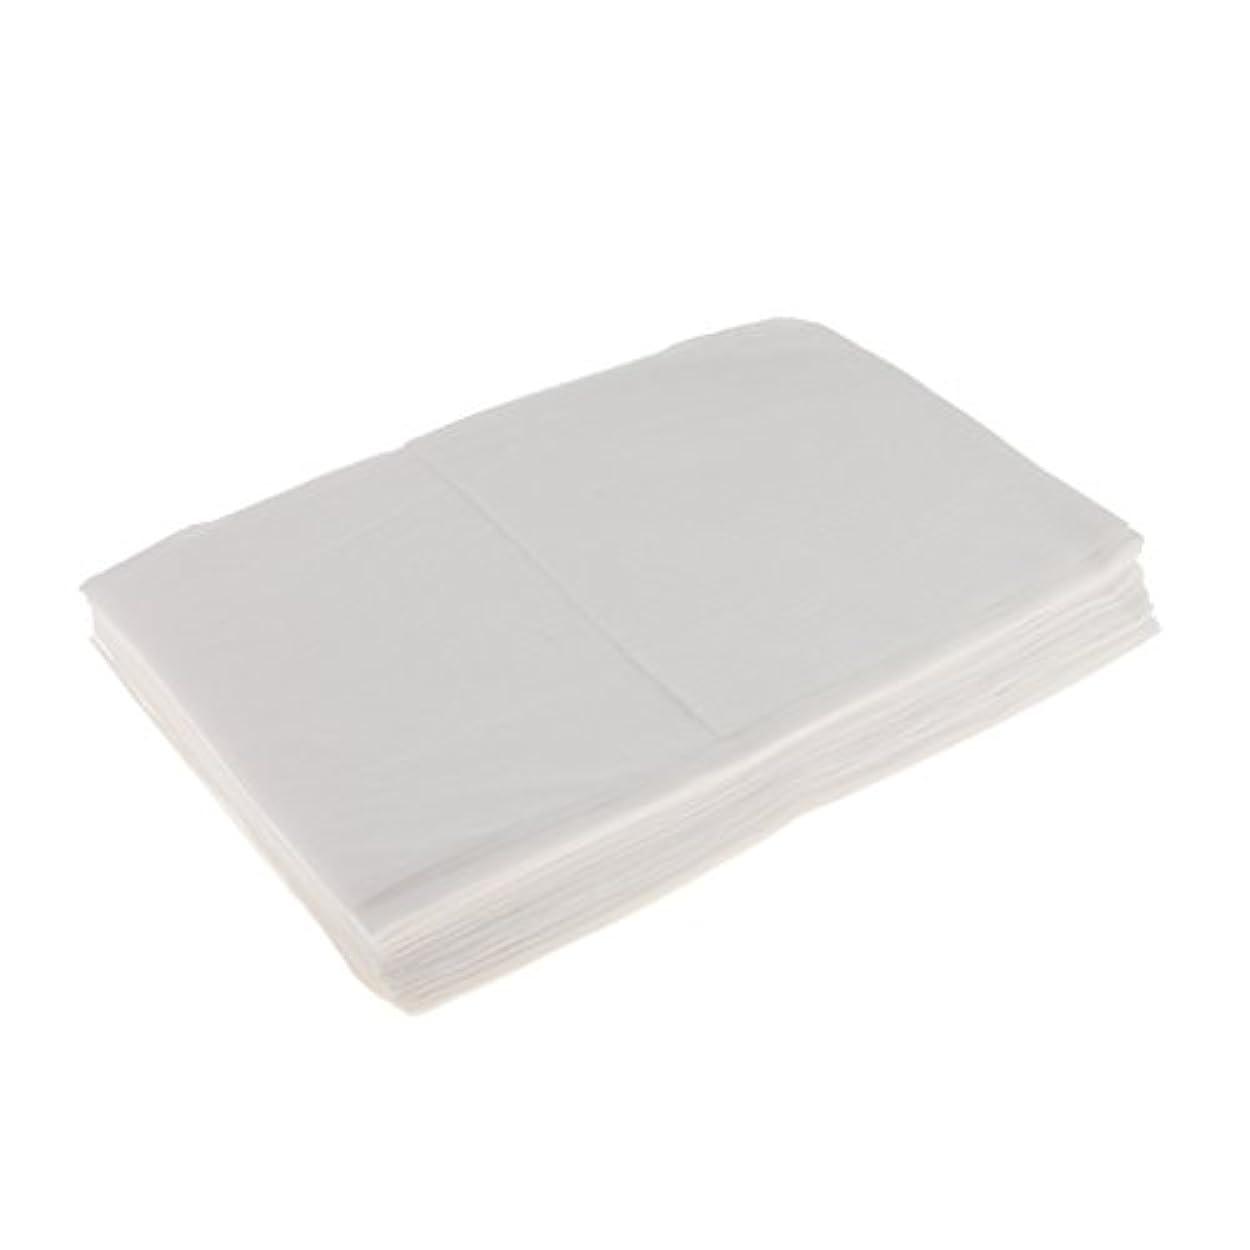 Kesoto 10枚 使い捨てベッドシーツ 使い捨て 美容 マッサージ サロン ホテル ベッドパッド カバー シート 2色選べ - 白